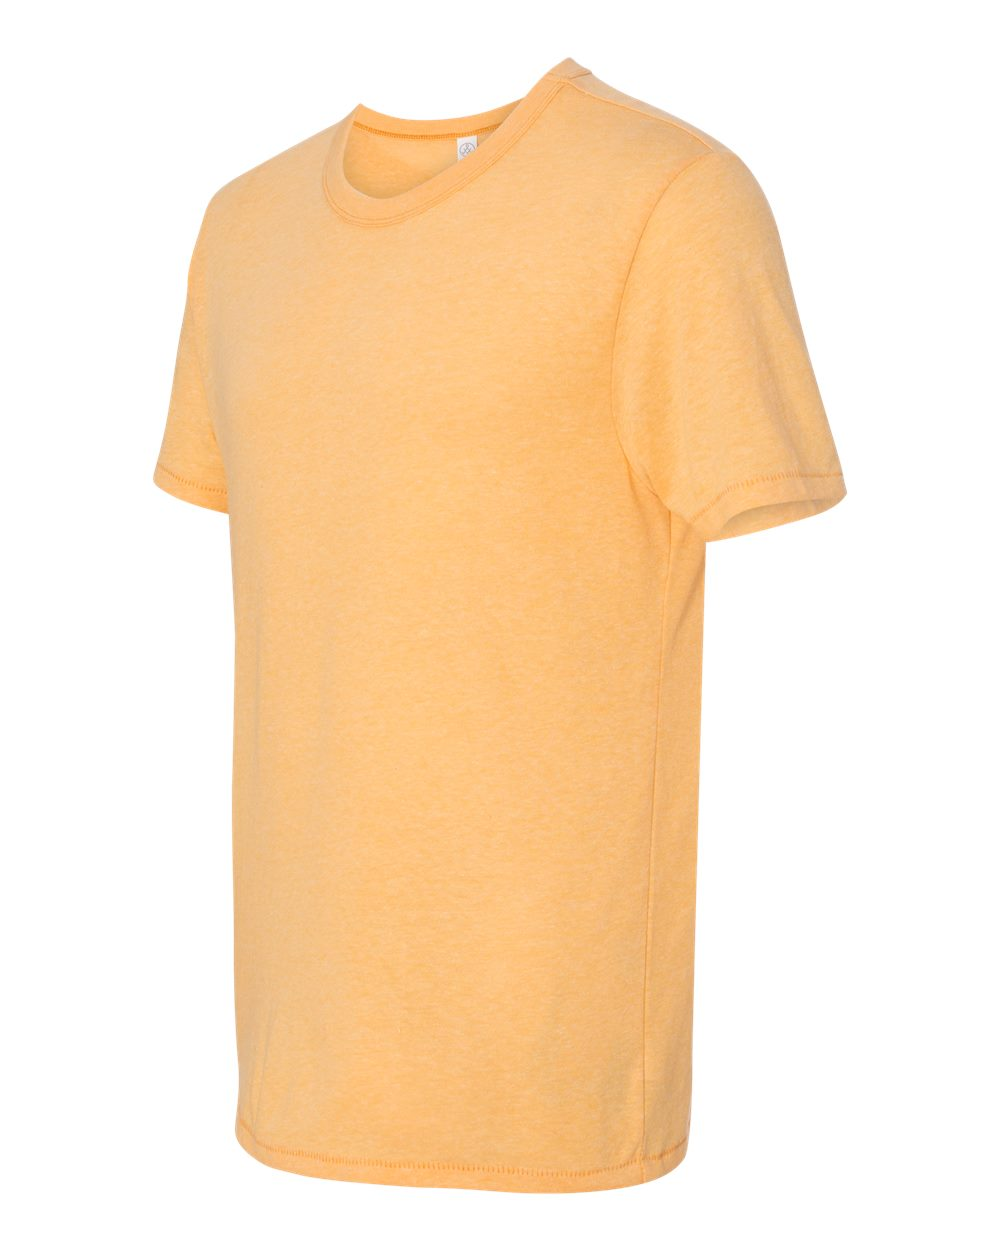 Alternative 5050 - Vintage 50/50 Jersey Keeper T-Shirt